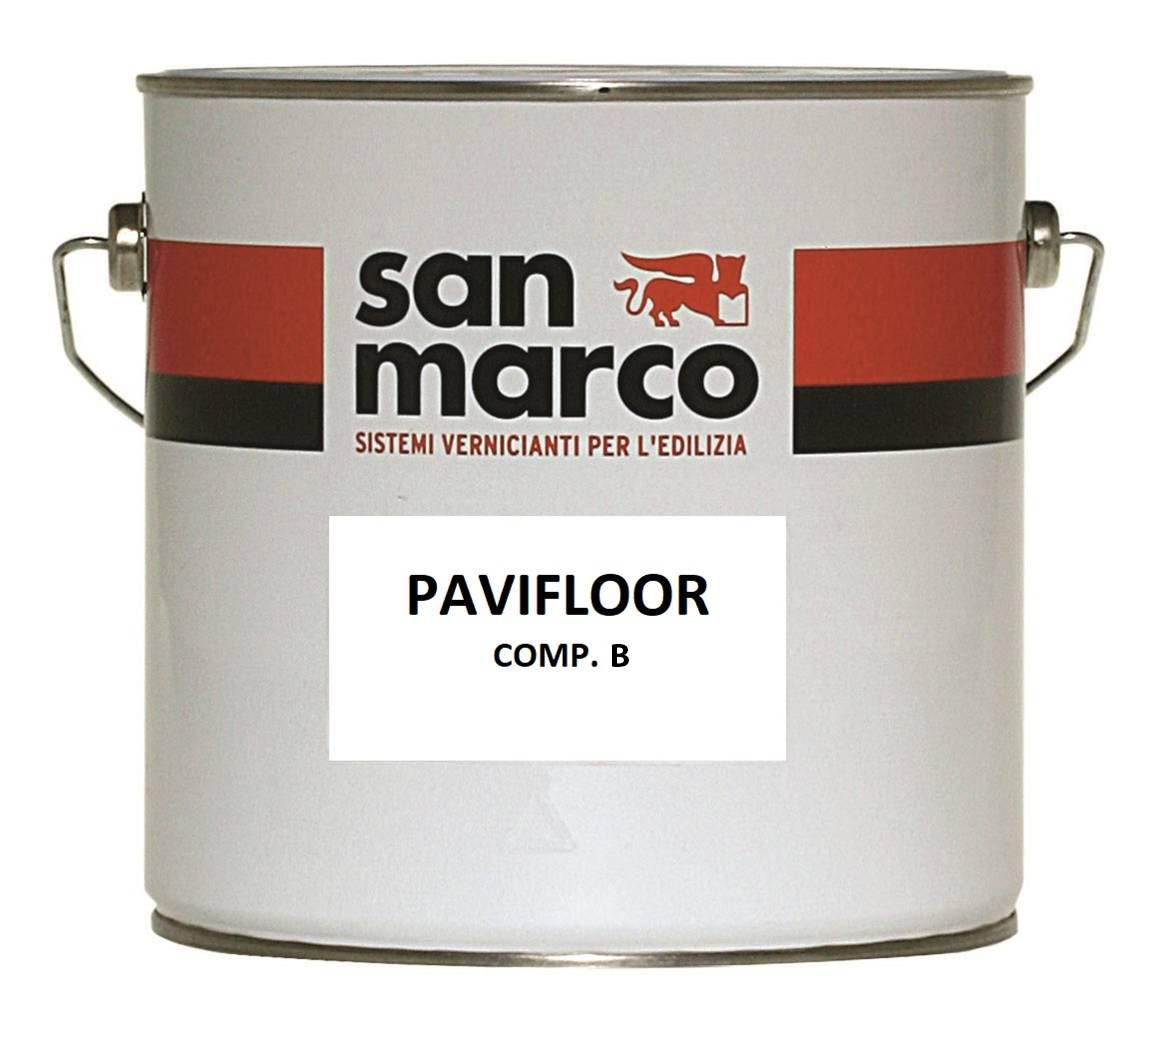 Pavifloor comp. B